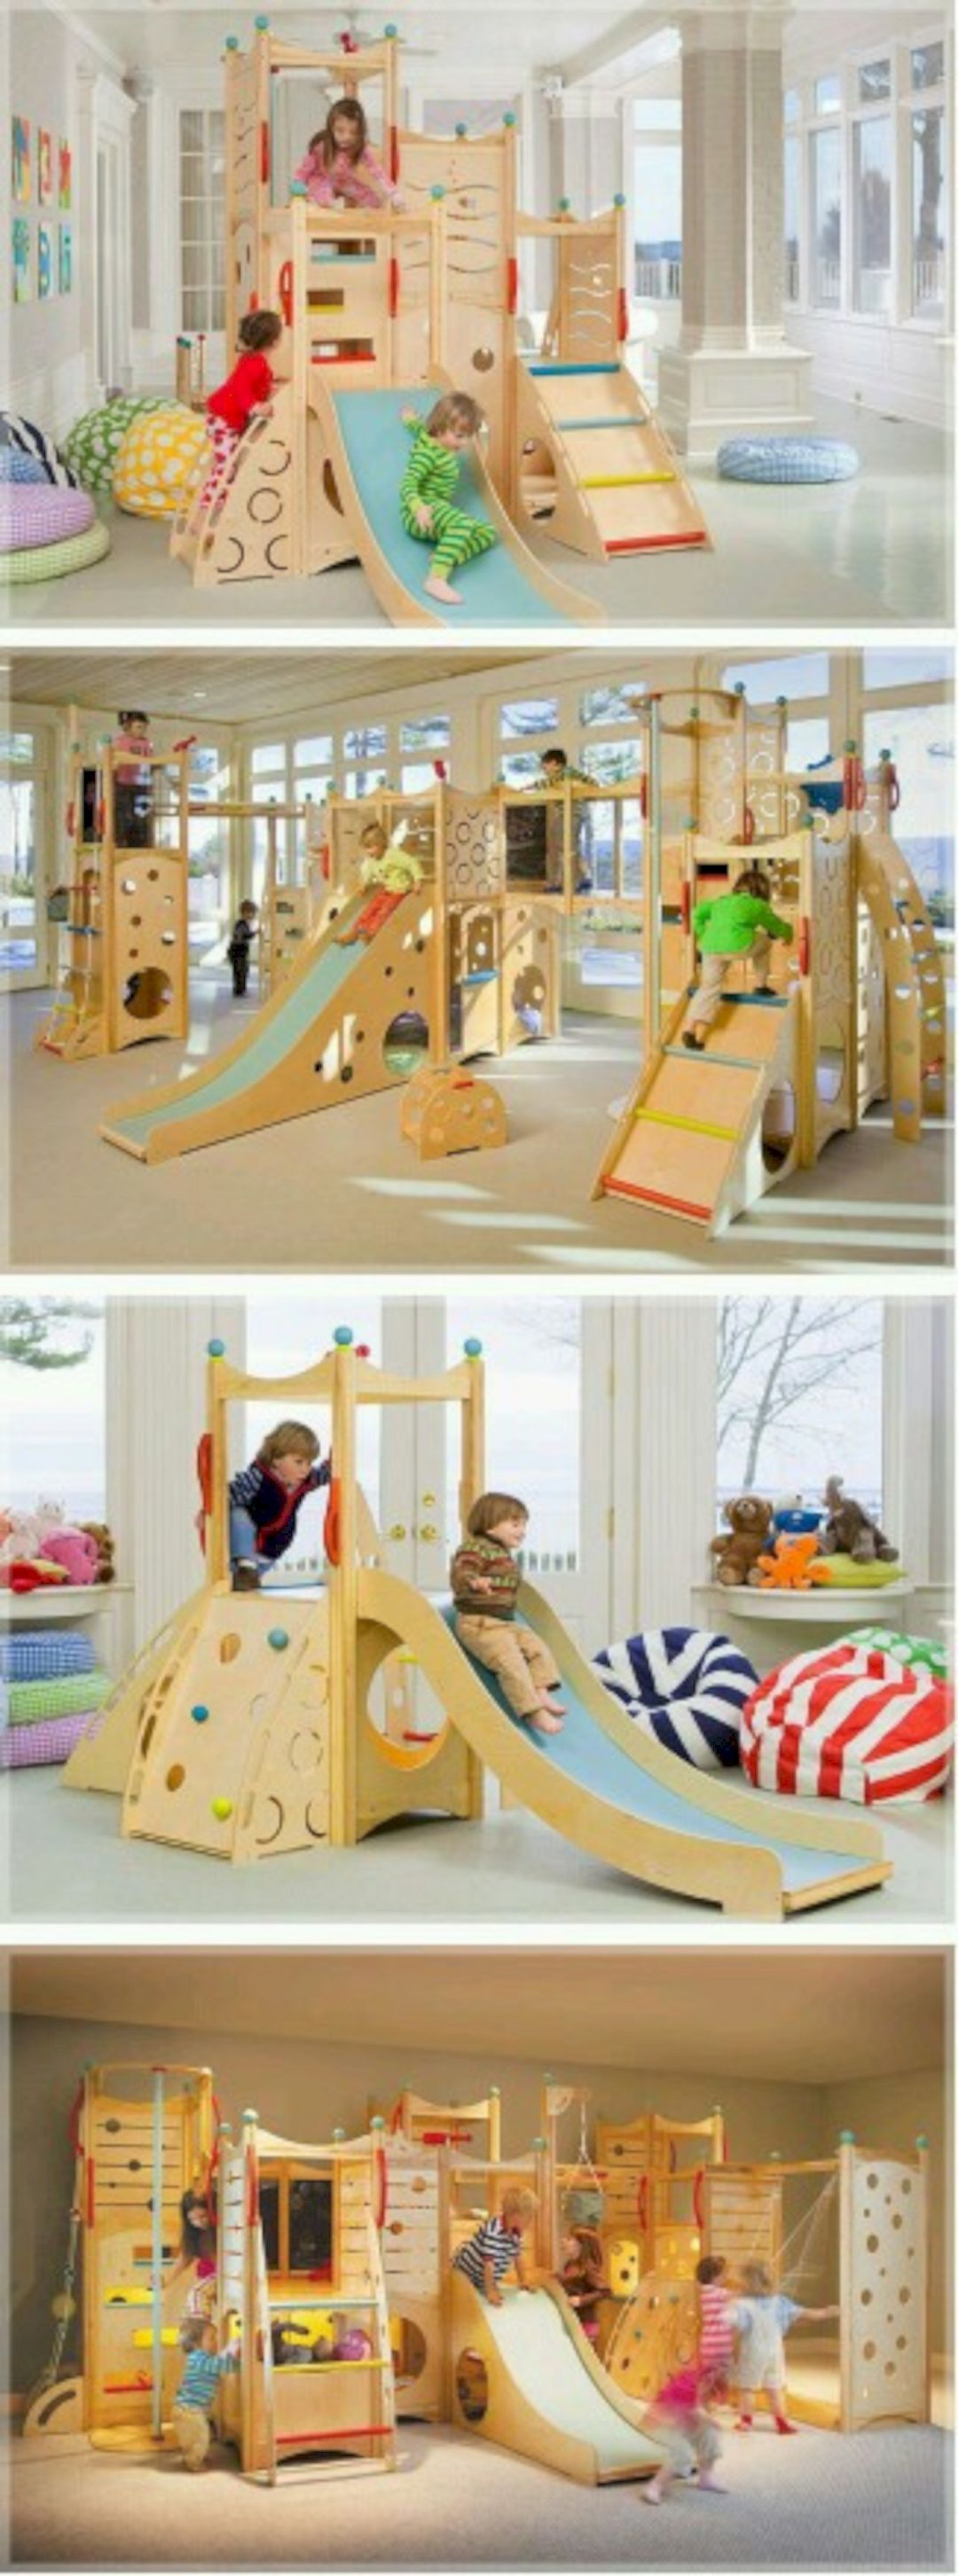 Small Backyard Ideas With Playgr Html on